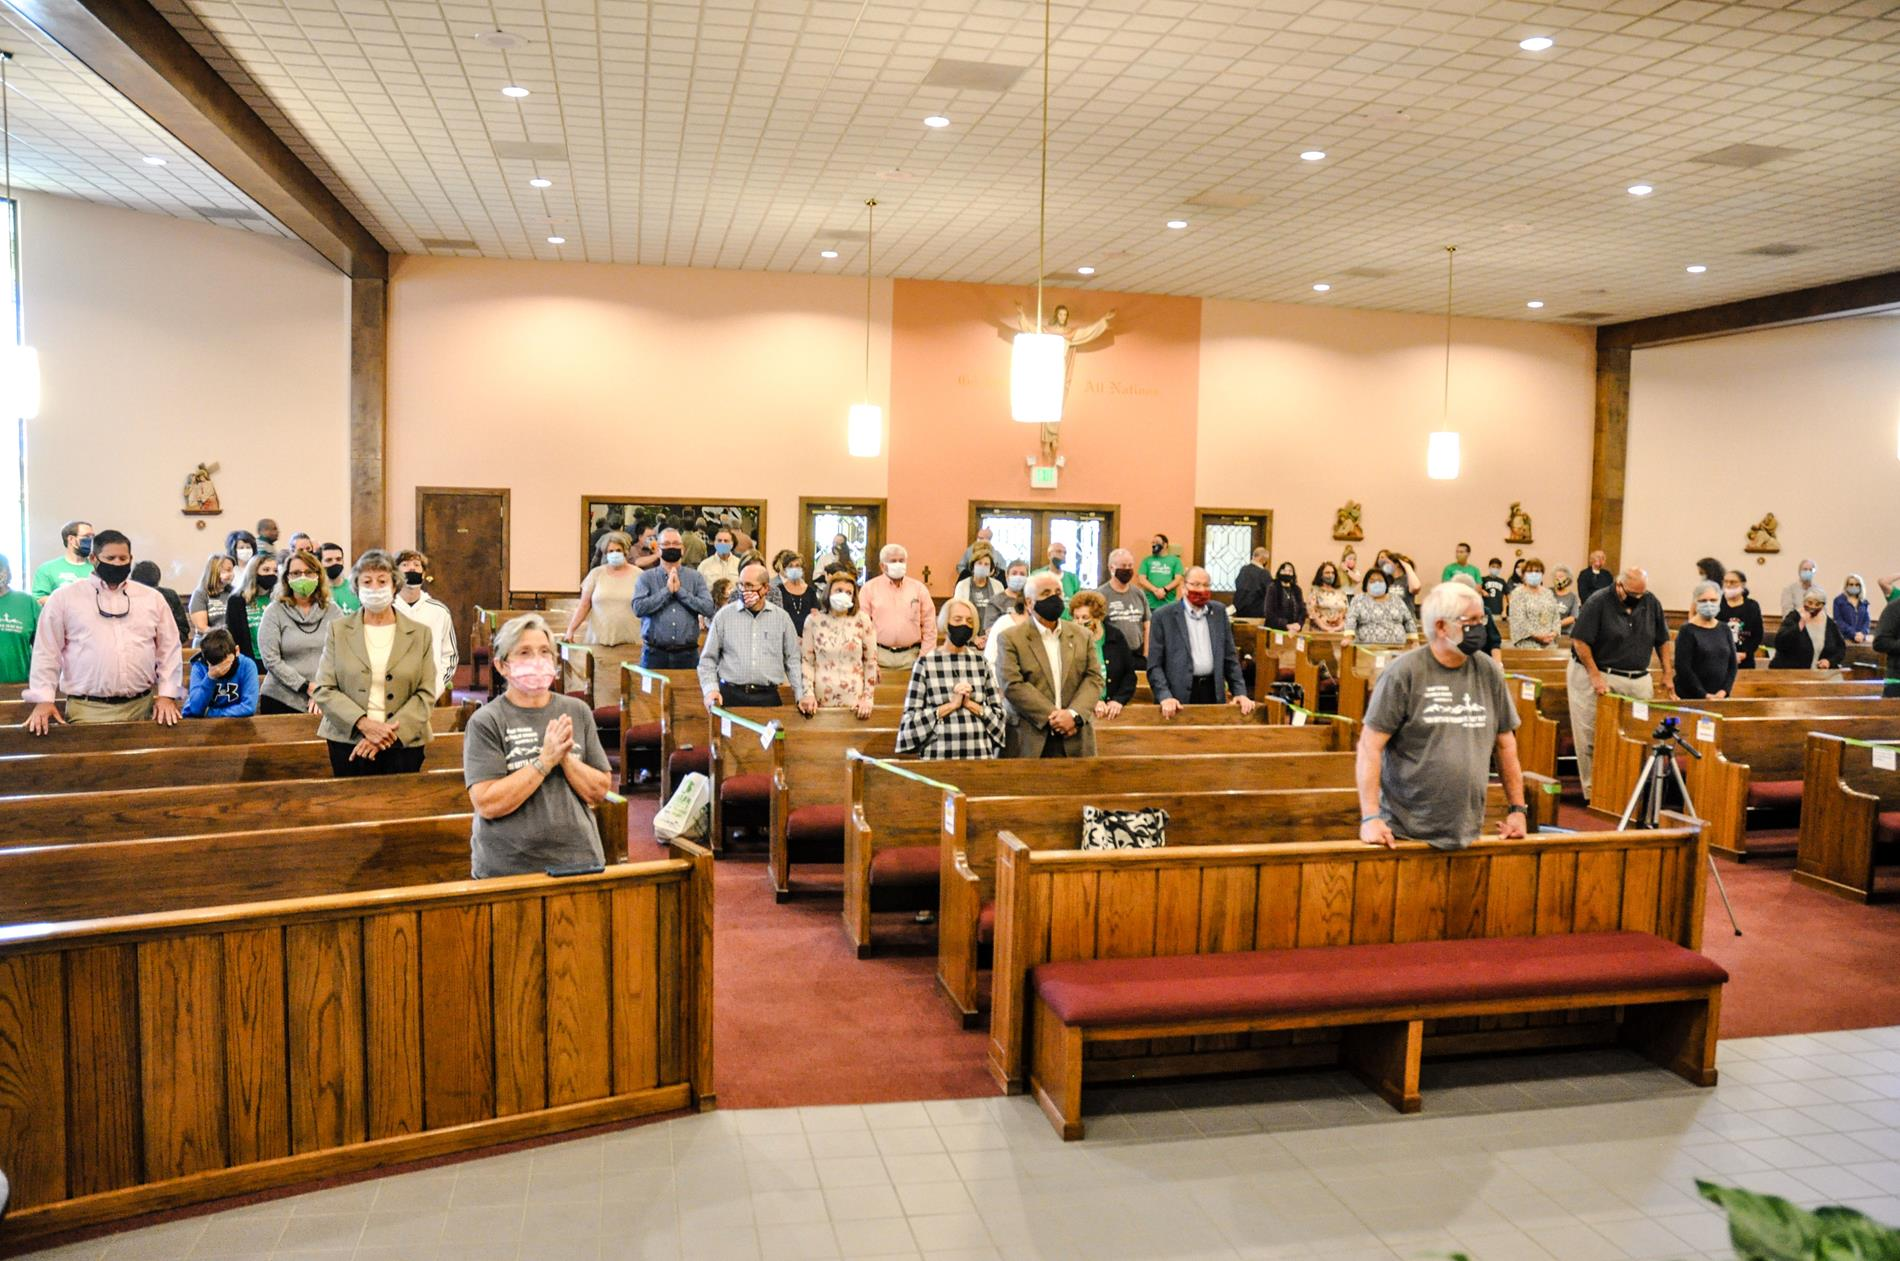 Center aisle of congregation